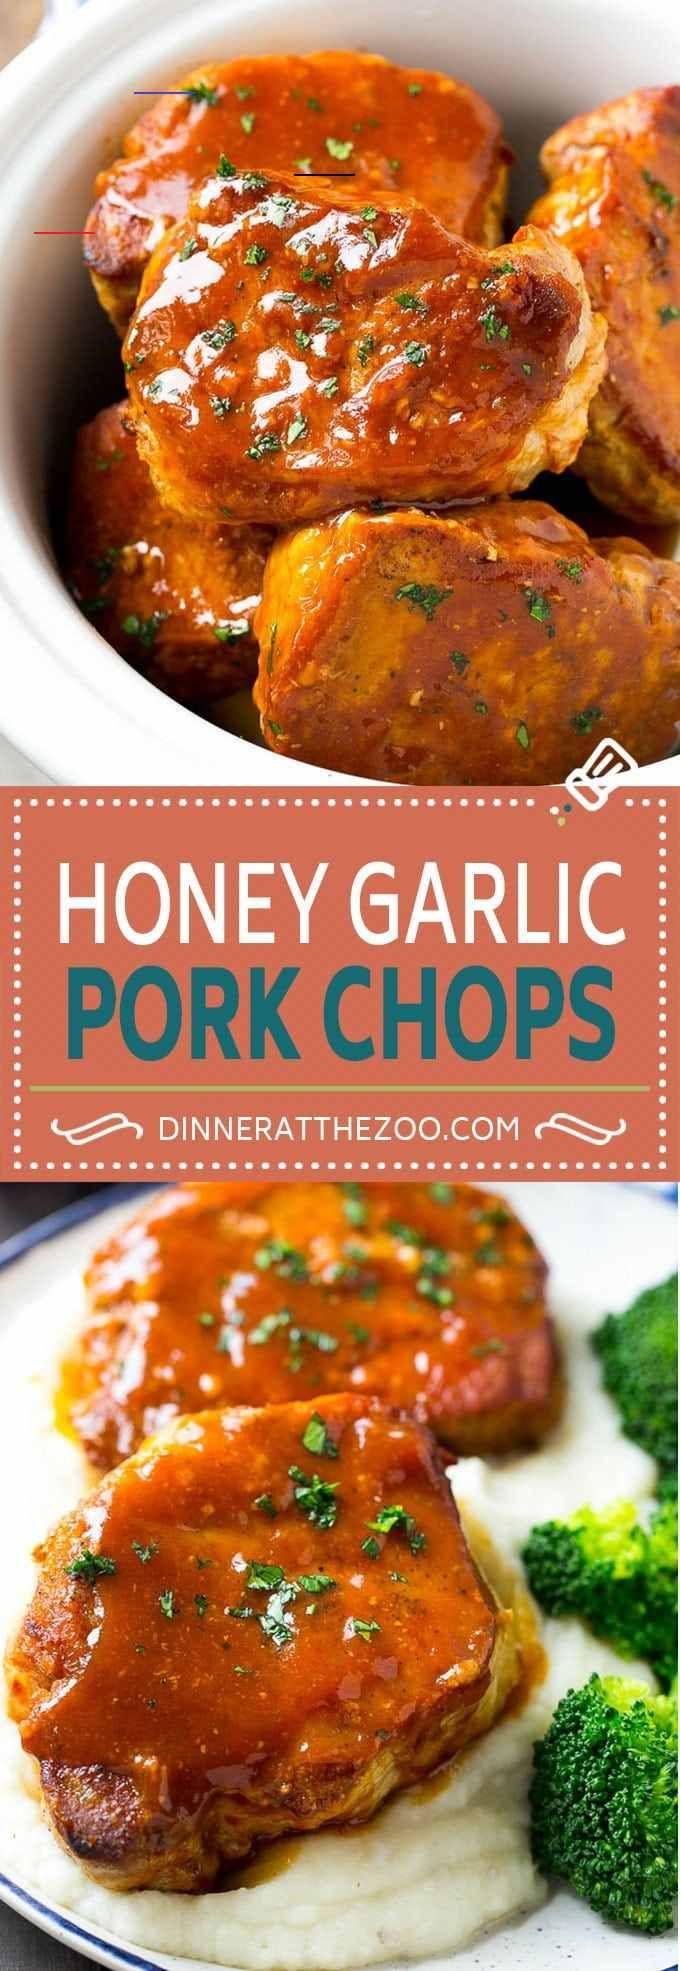 Honey Garlic Pork Chops (Slow Cooker) Honey Garlic Pork Chops (Slow Cooker) Honey Garlic Pork Chops Recipe | Slow Cooker Pork Chops | Crock Pot Pork Chops | Boneless Pork Chops Recipe #porkchops #pork #slowcooker #crockpot #dinner #dinneratthezoo<br>